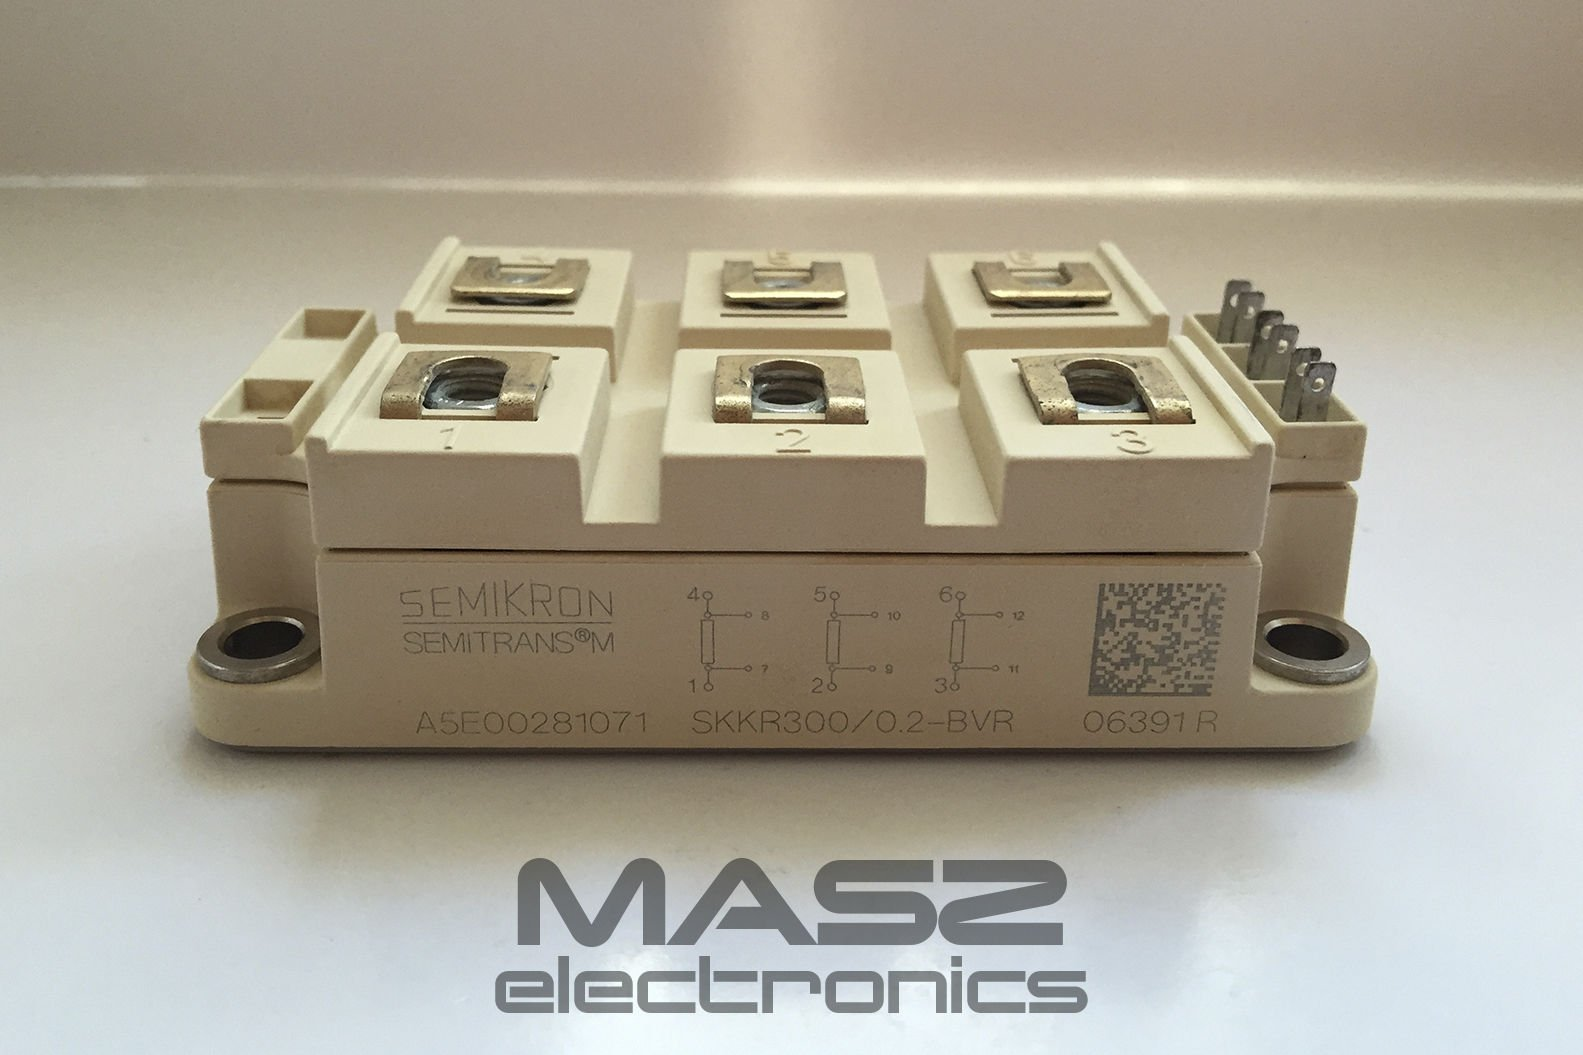 Semikron - New Skkr300/0.2-Bvr Semikron Module Original